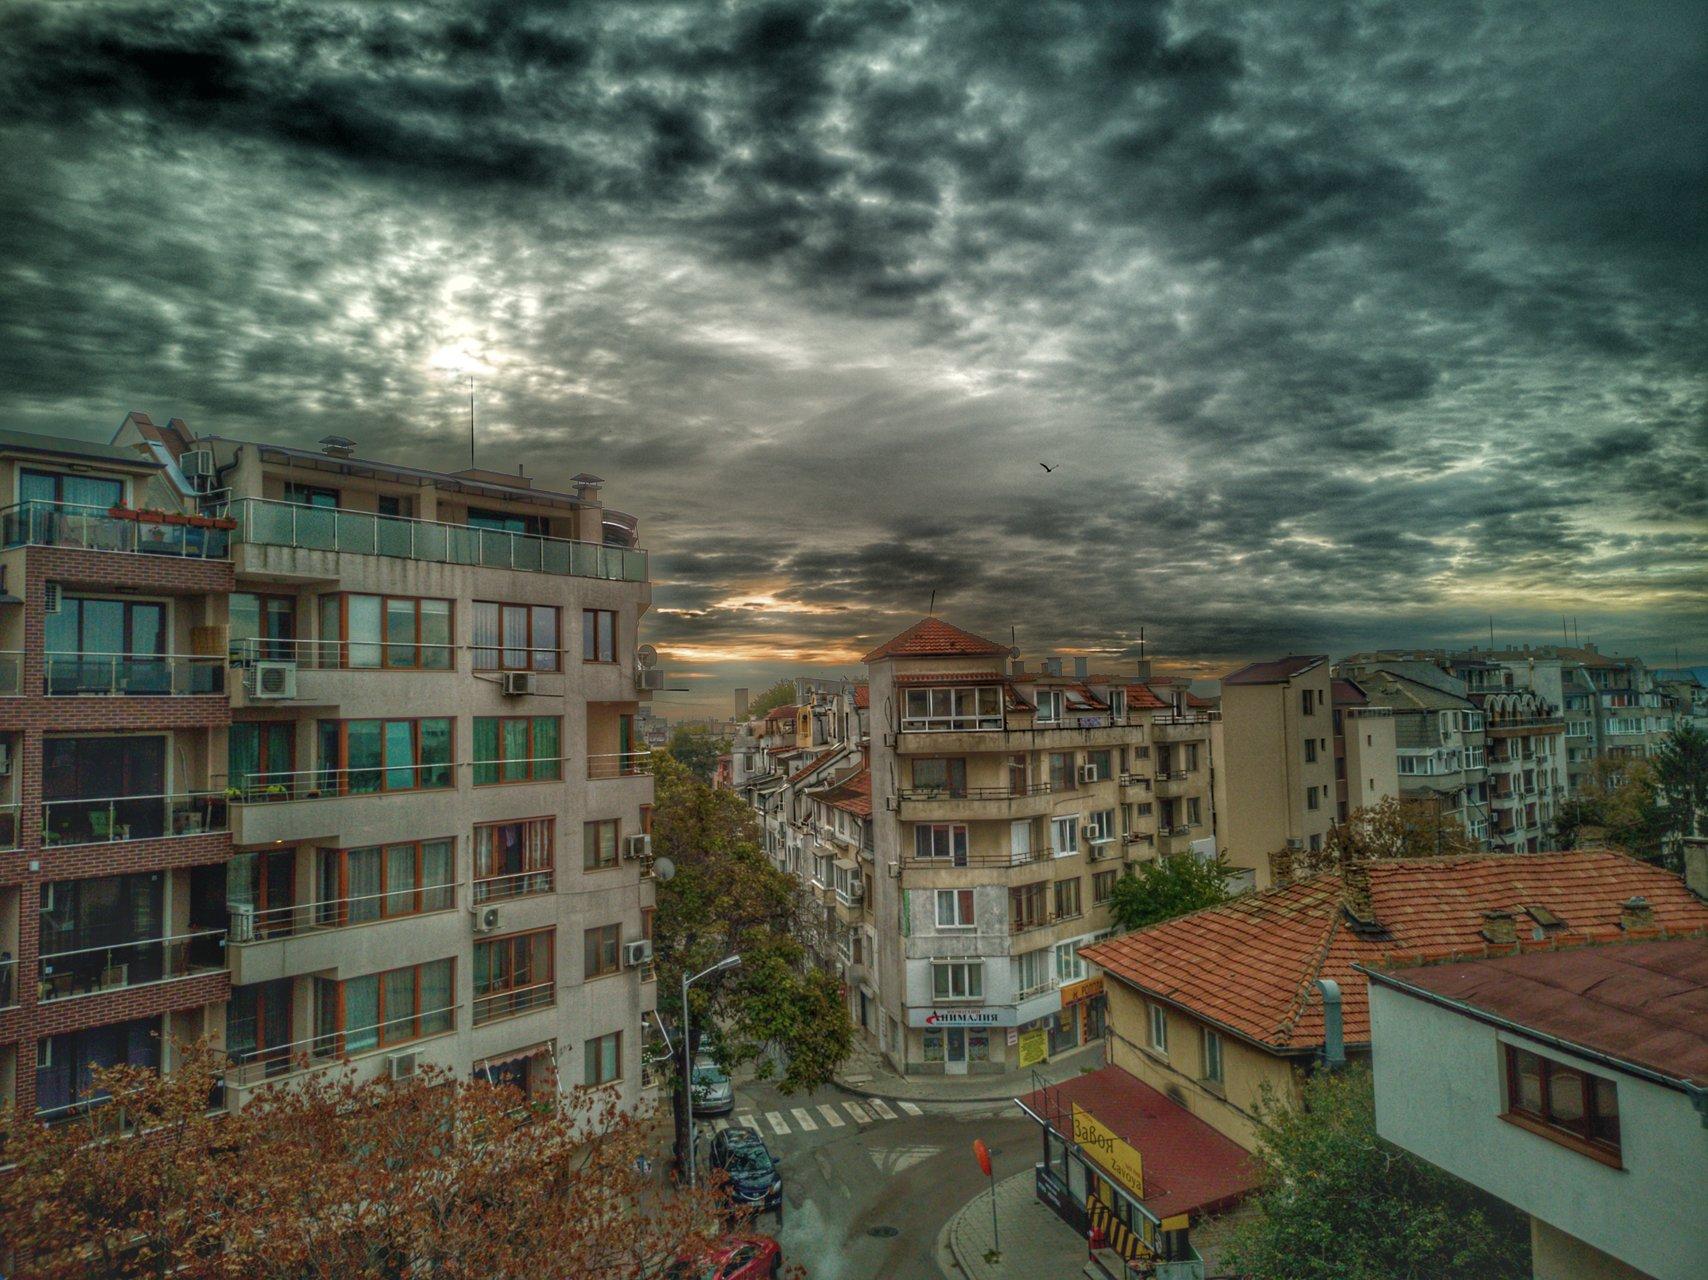 Варна от друг ъгъл | Author plamenski4 | PHOTO FORUM